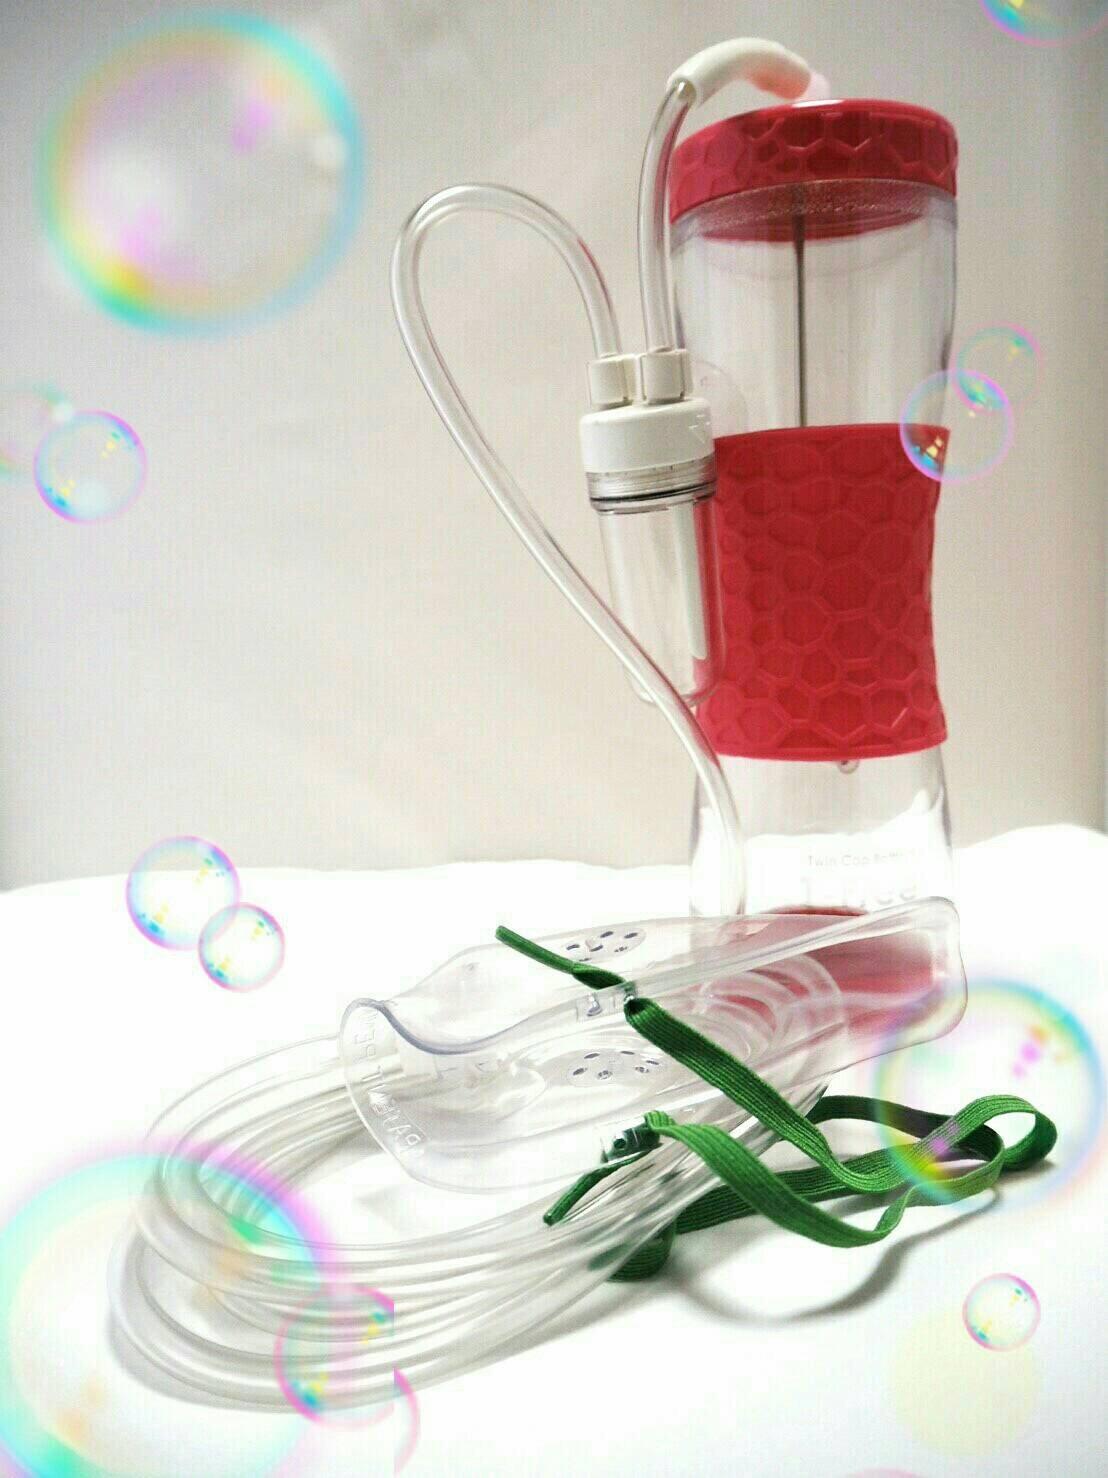 水素吸入器 HIDRO VITA ピンク H2 (黒) VITA B01LXSFYG8 ピンク H2 ピンク, 古本倶楽部:2734b1ec --- malebeauty.xyz